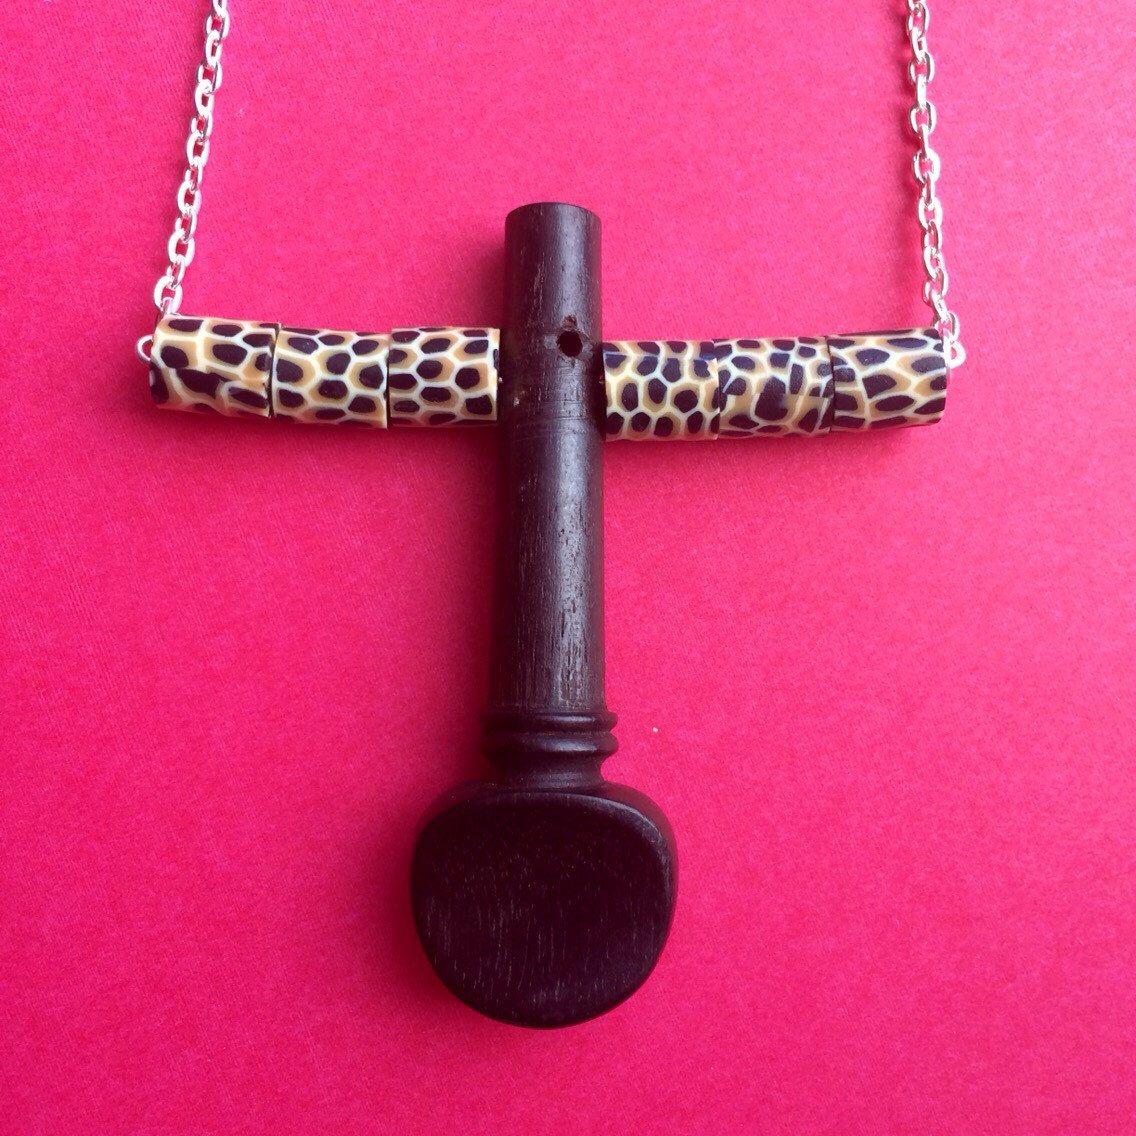 Upcycled ebony violin tuning peg pendant with animal print